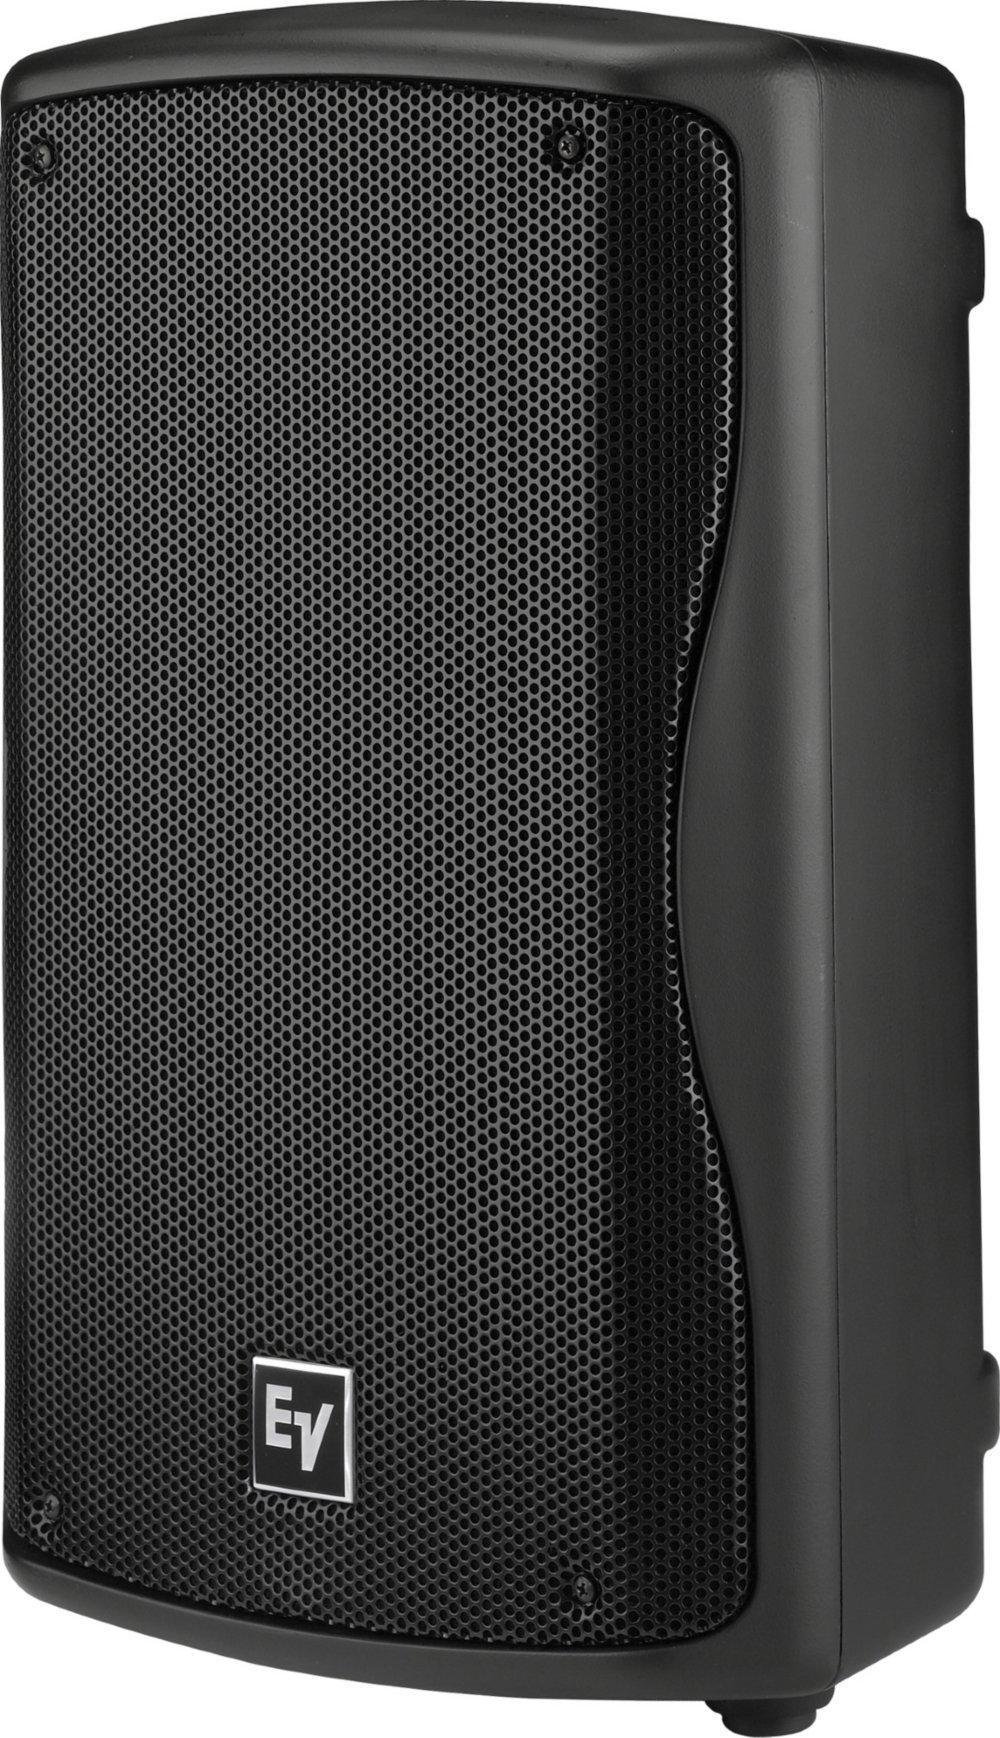 Electro-voice 8-InchTwo-Way, 90° x 50° Indoor/Outdoor Portable Loudspeaker System